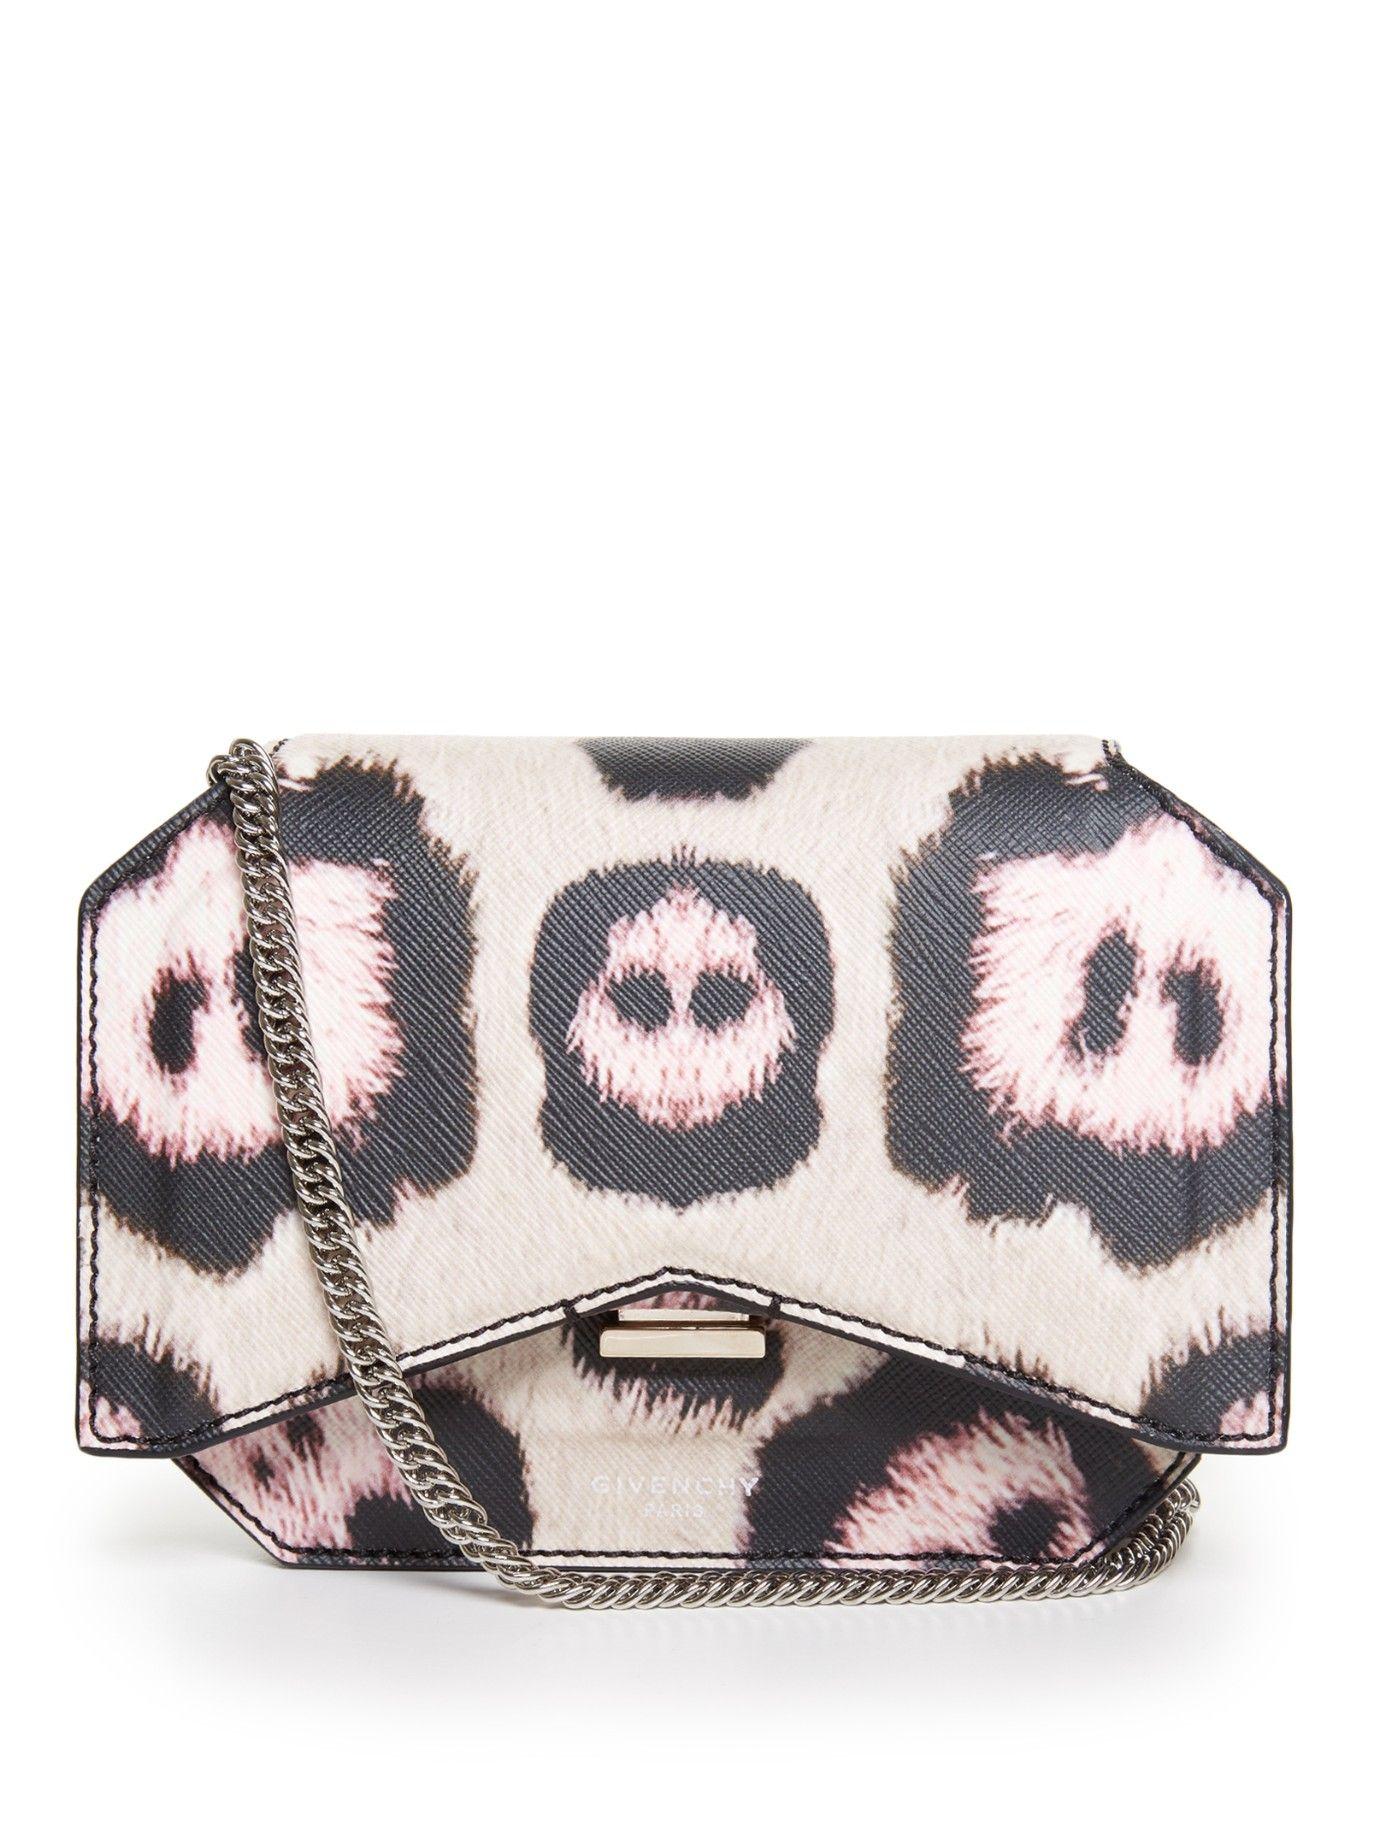 hobo jaguar product fendi bag mini shoes today canvas clothing print free shipping handbags